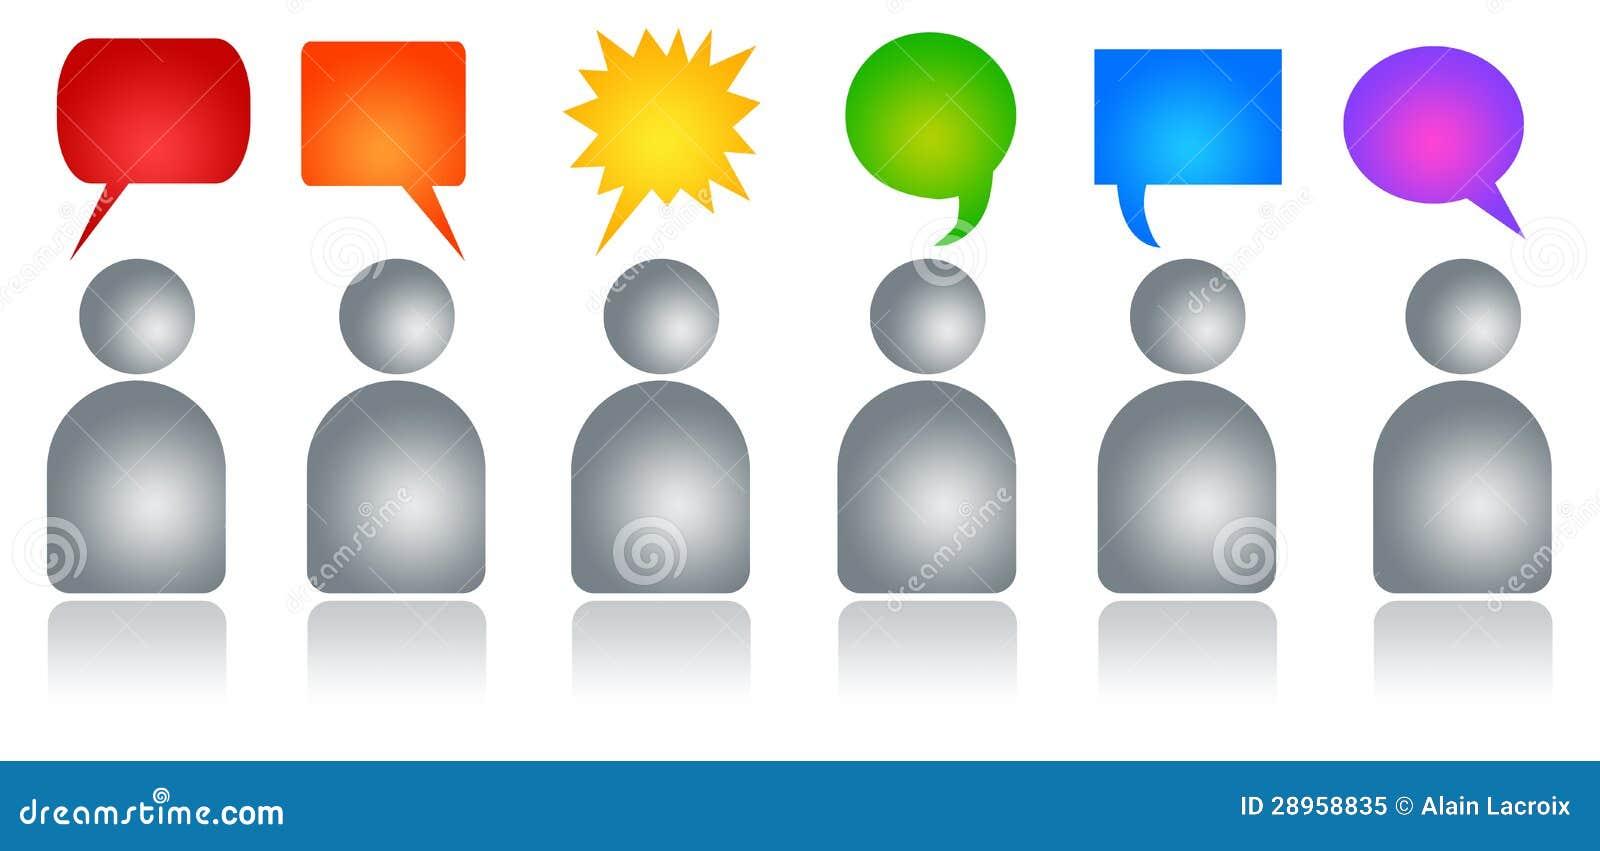 Effective Communication & Team Work